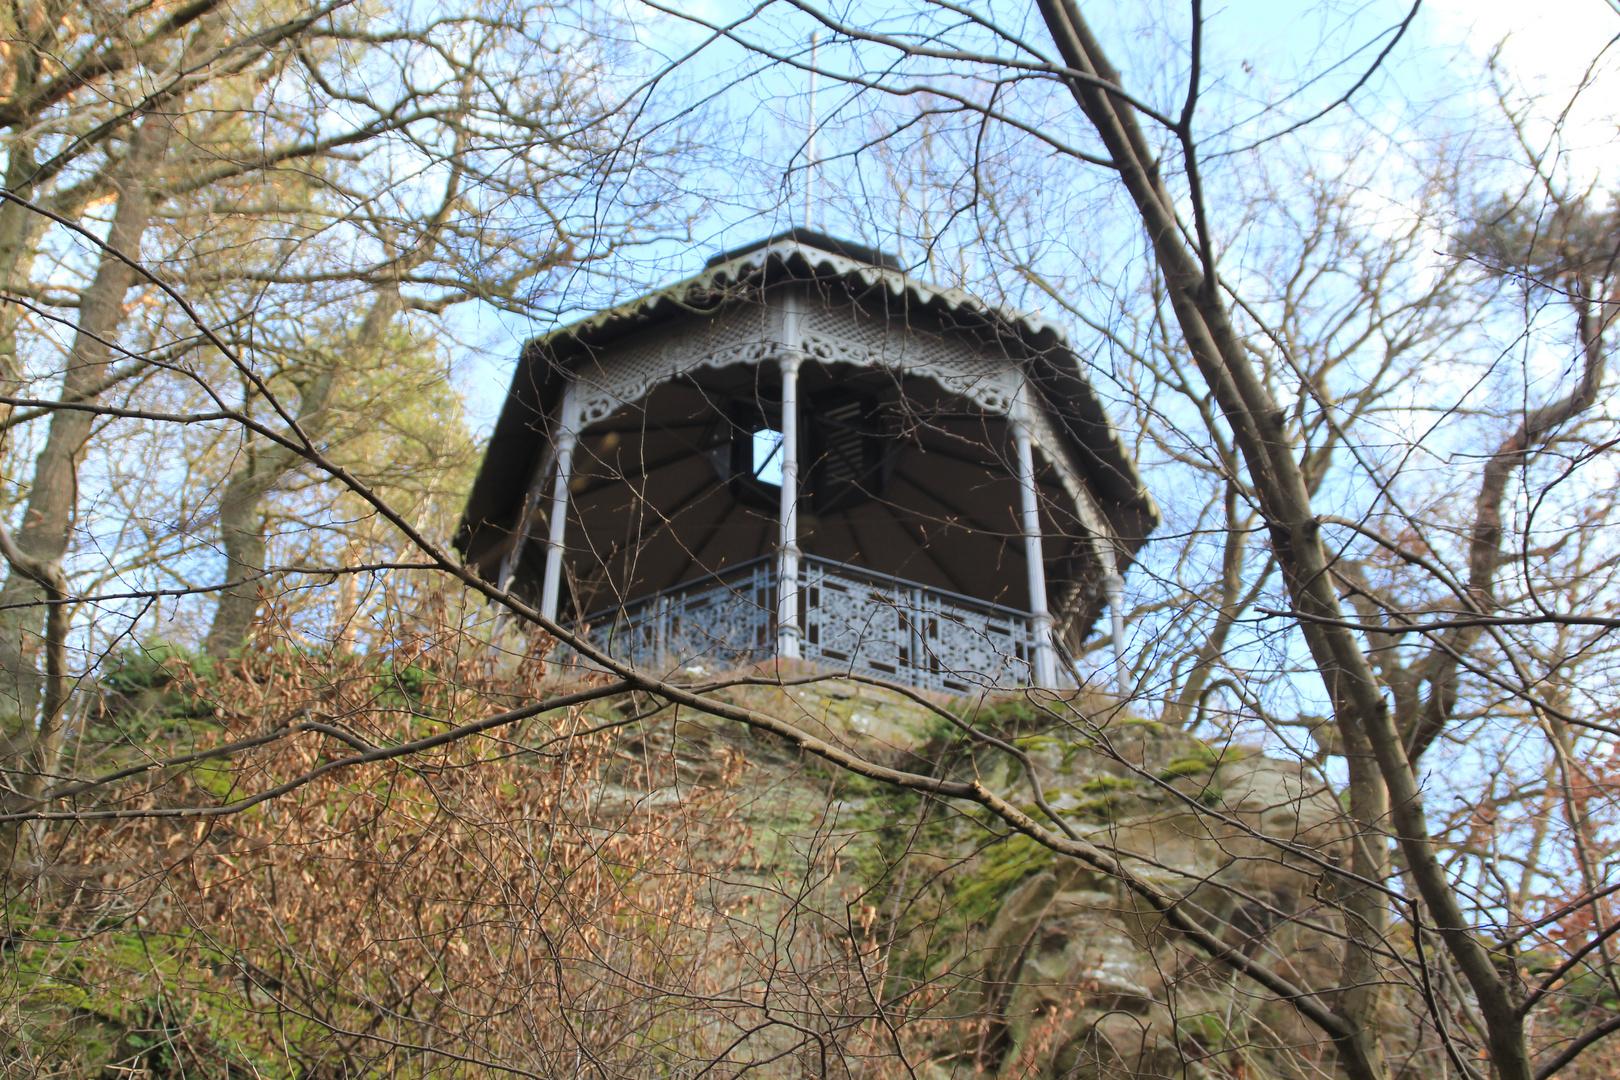 Hombergtempel in Herborn